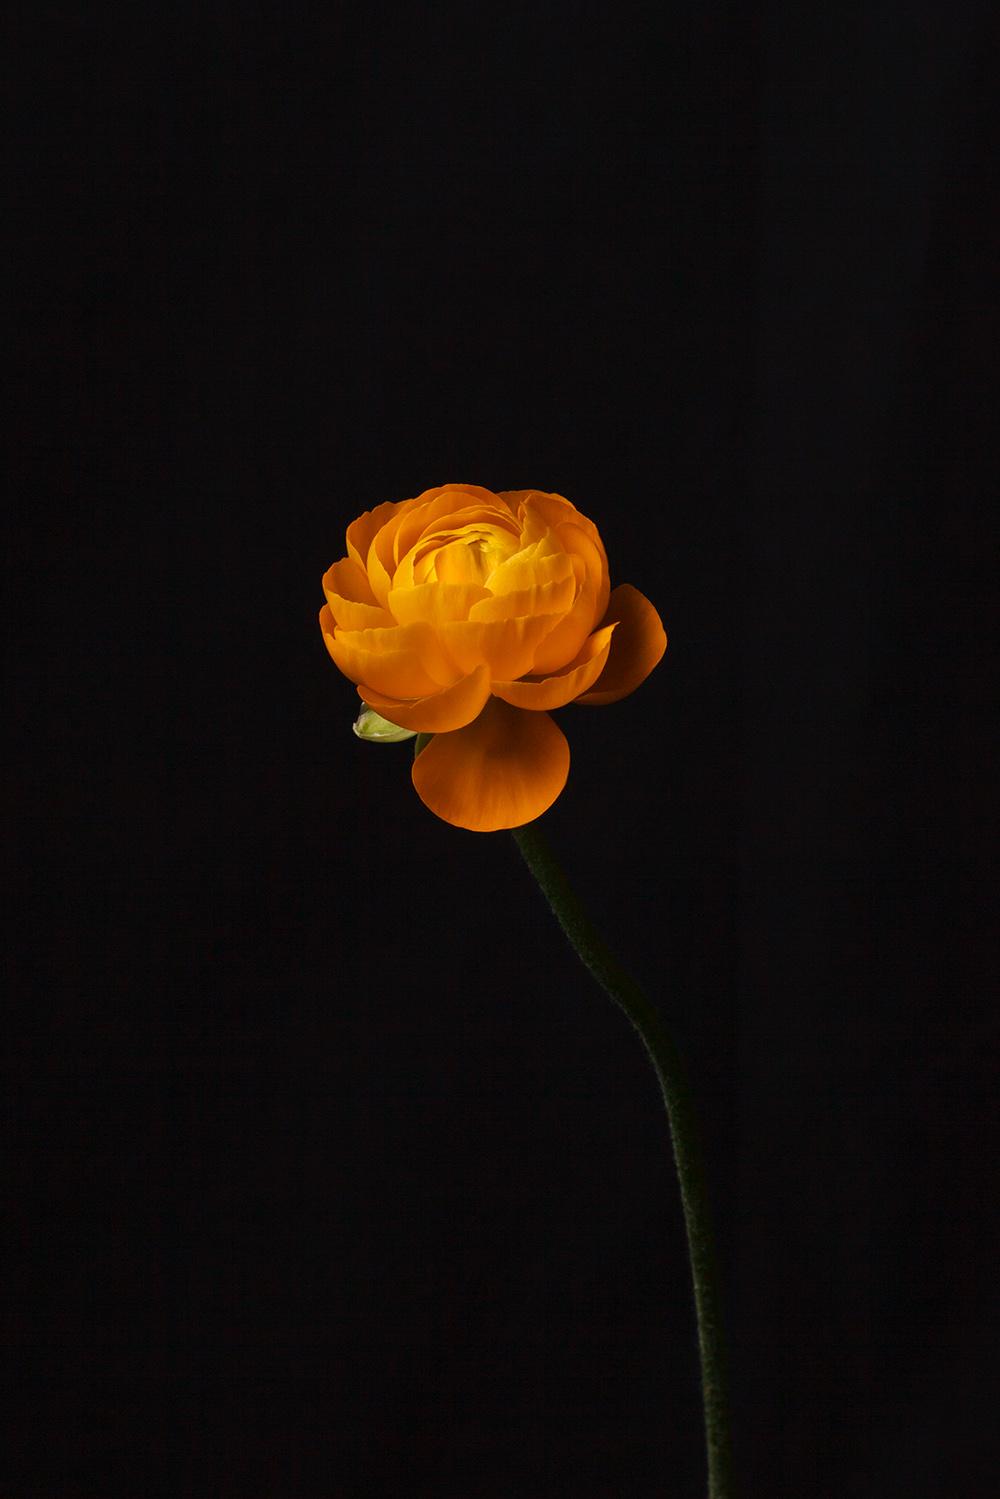 Still Life with Flower, 2009